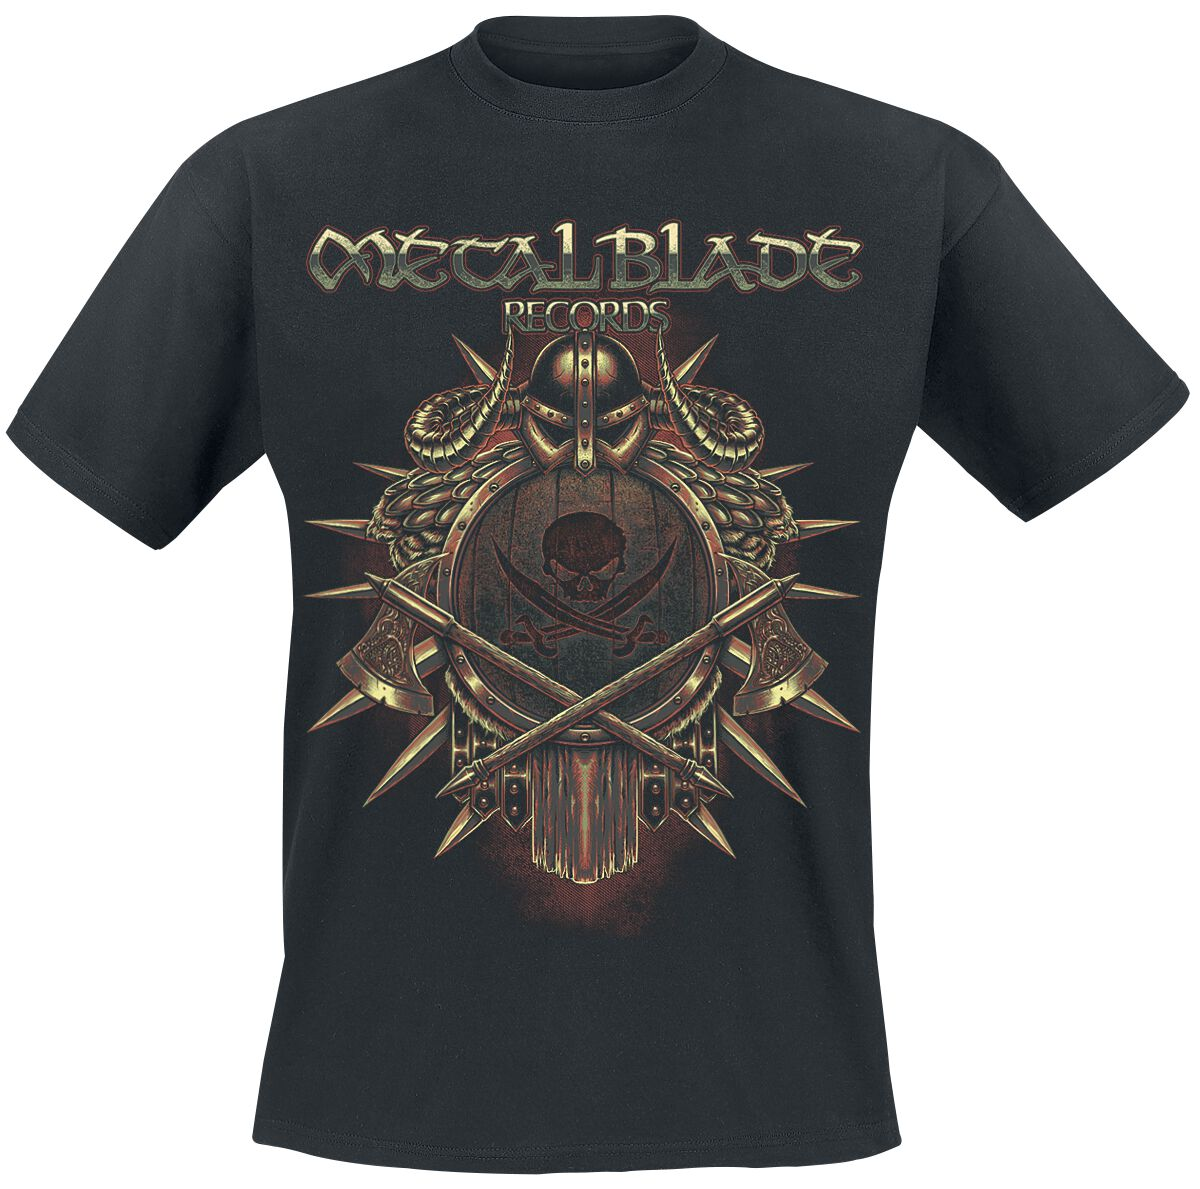 Zespoły - Koszulki - T-Shirt Metal Blade Viking T-Shirt czarny - 318768